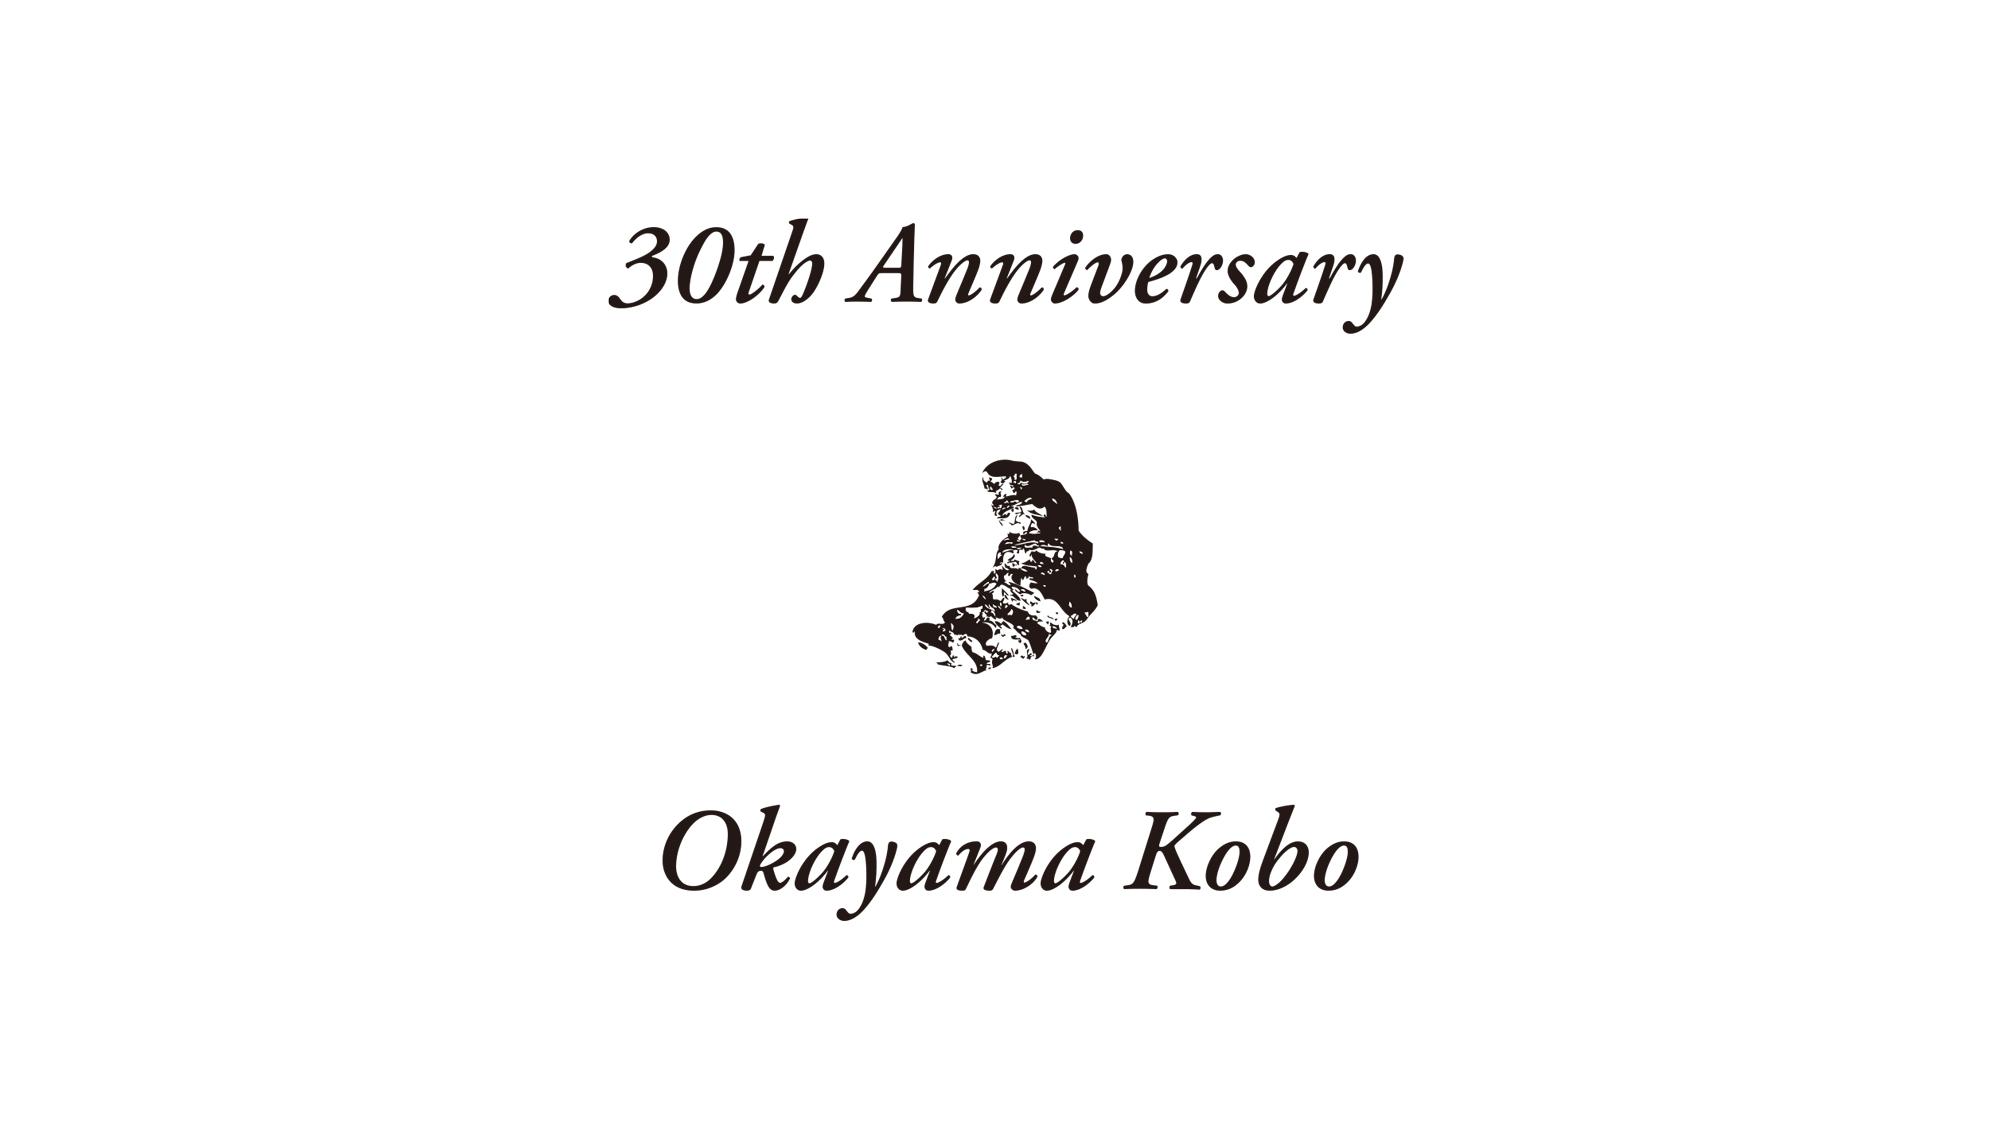 『30th Anniversary Okayama Kobo』